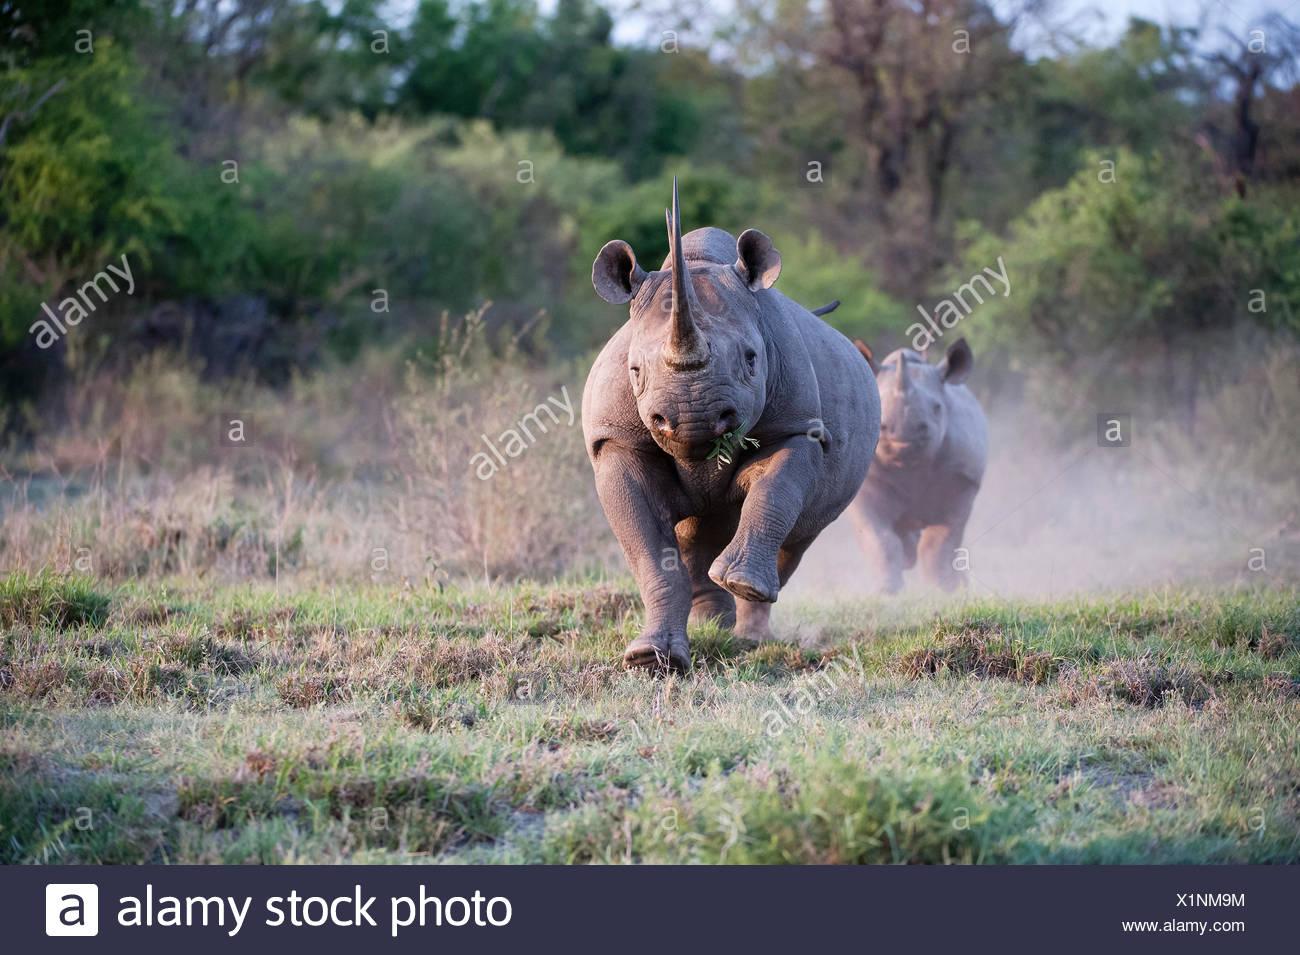 An adult female Black Rhinoceros (Diceros bicornis) charging with calf behind, Madikwe Game Reserve, South Africa - Stock Image